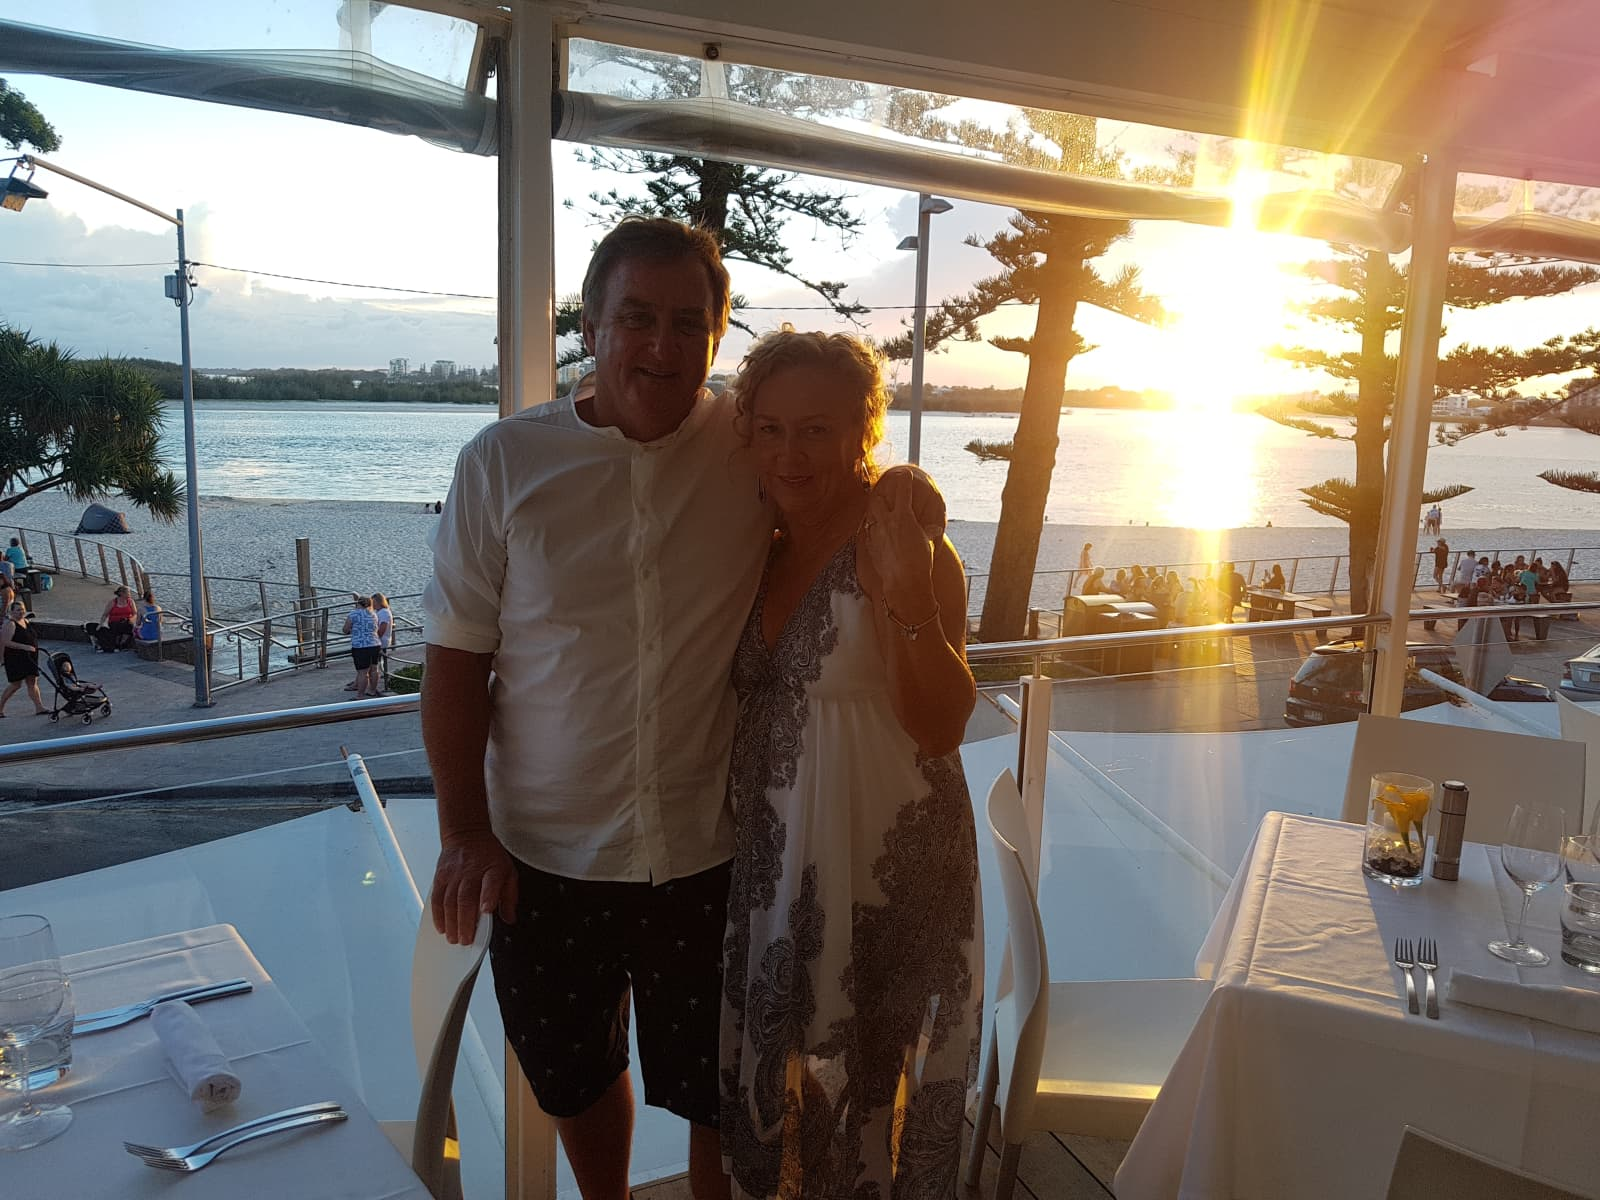 Gail & gary & Gary from Caloundra, Queensland, Australia